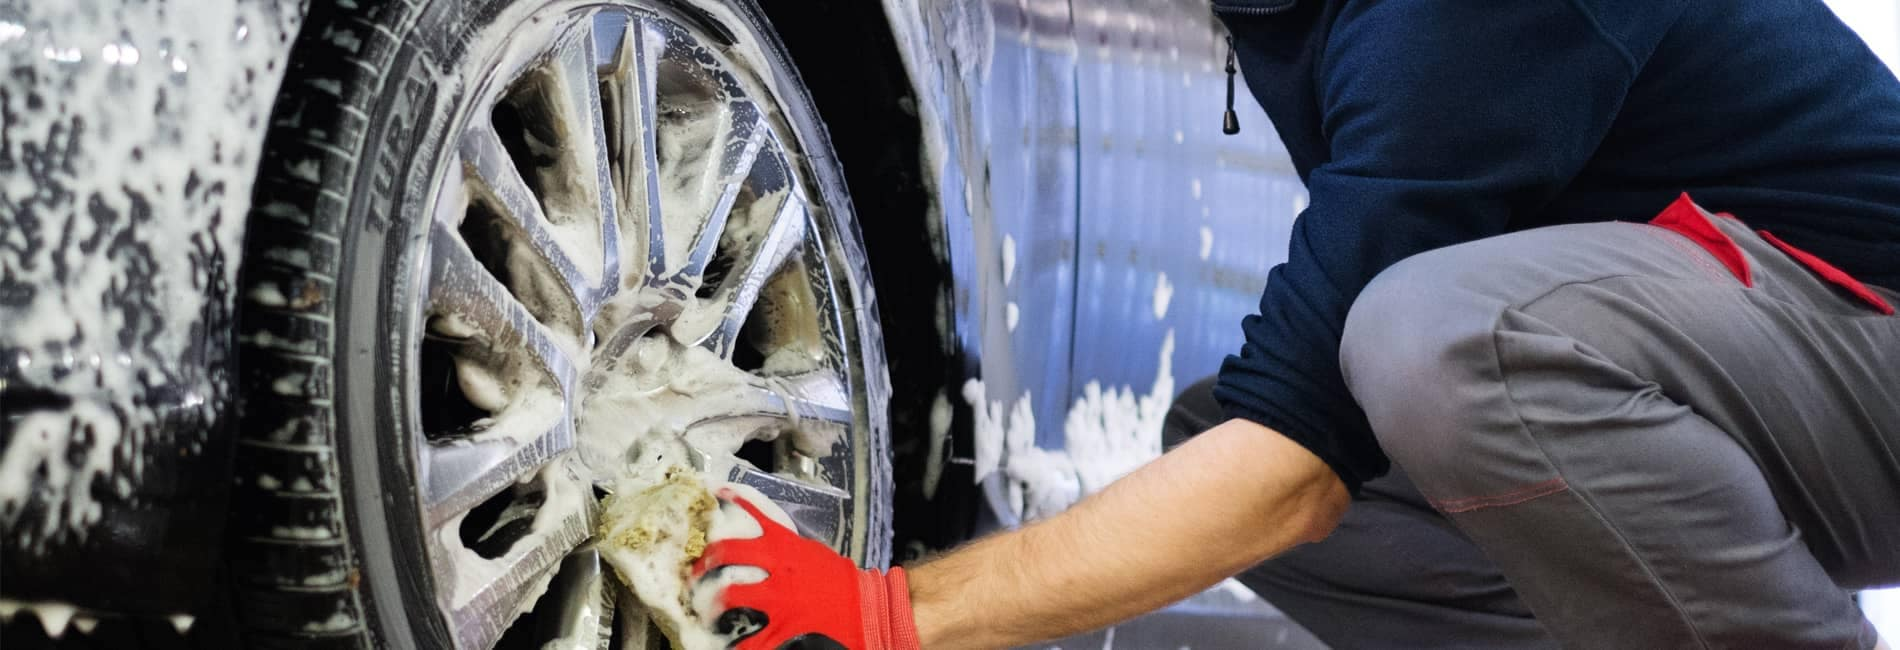 person washing a car tire